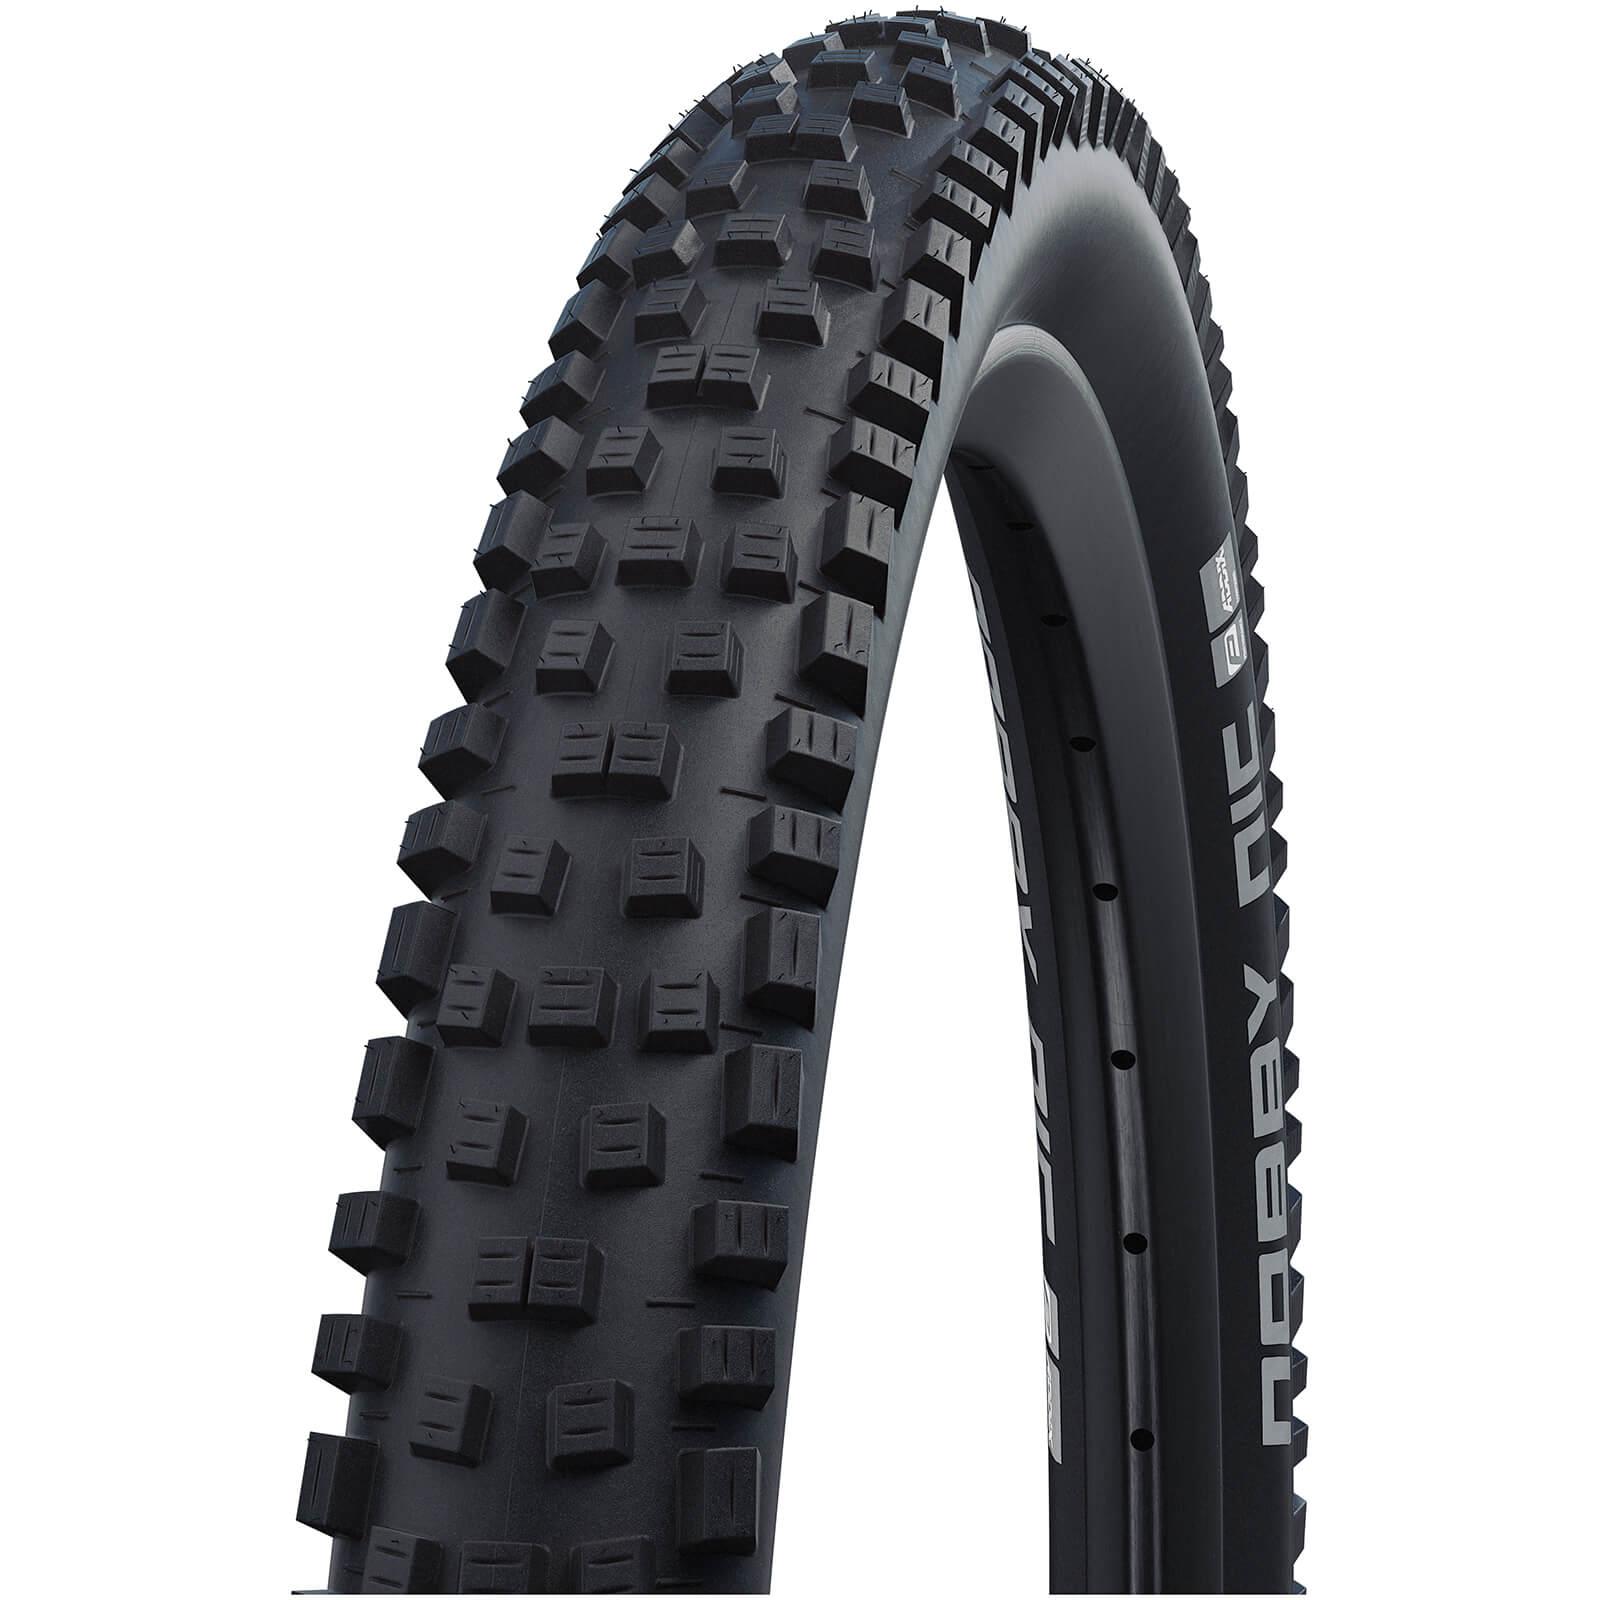 Schwalbe Nobby Nic Performance TwinSkin Clincher MTB Tyre - Black - 26in x 2.25in